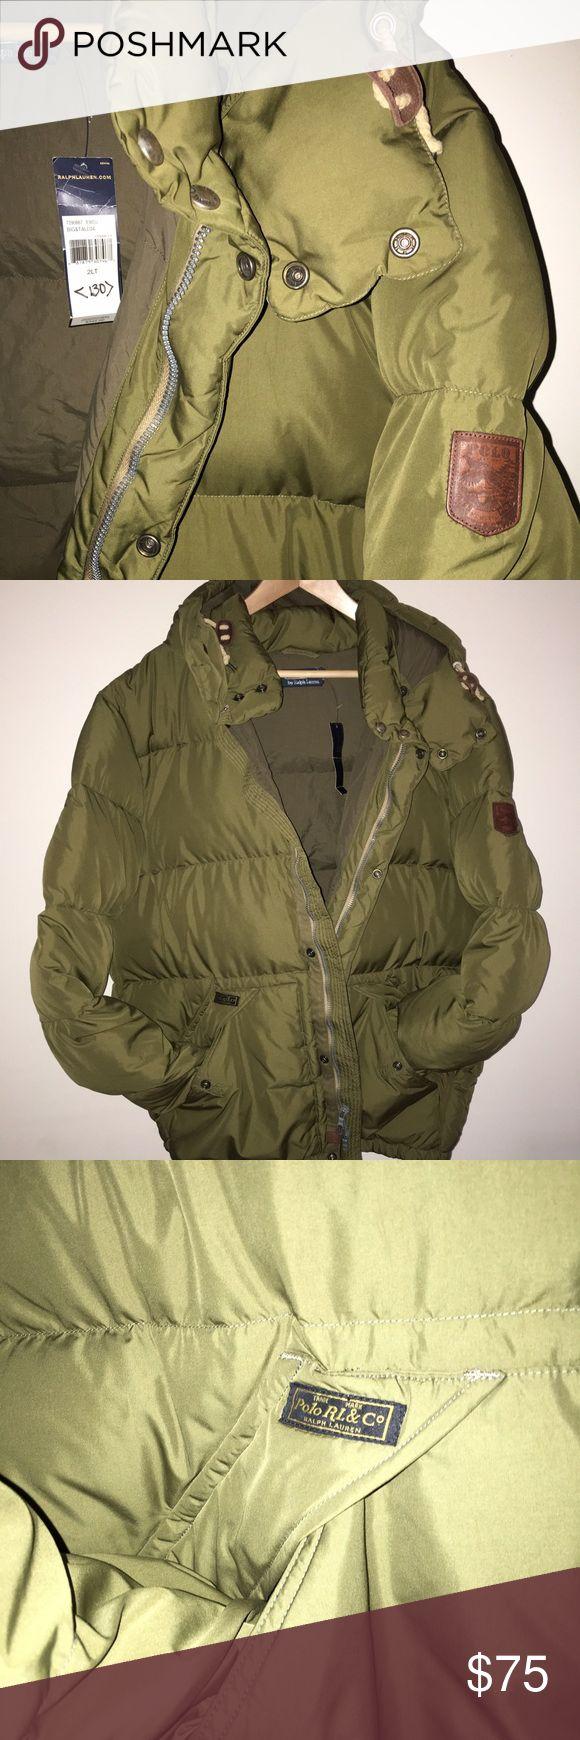 Polo by Ralph Lauren goose coat 2XL TALL (big&tall) - military green - detachable hood Polo by Ralph Lauren Jackets & Coats Puffers